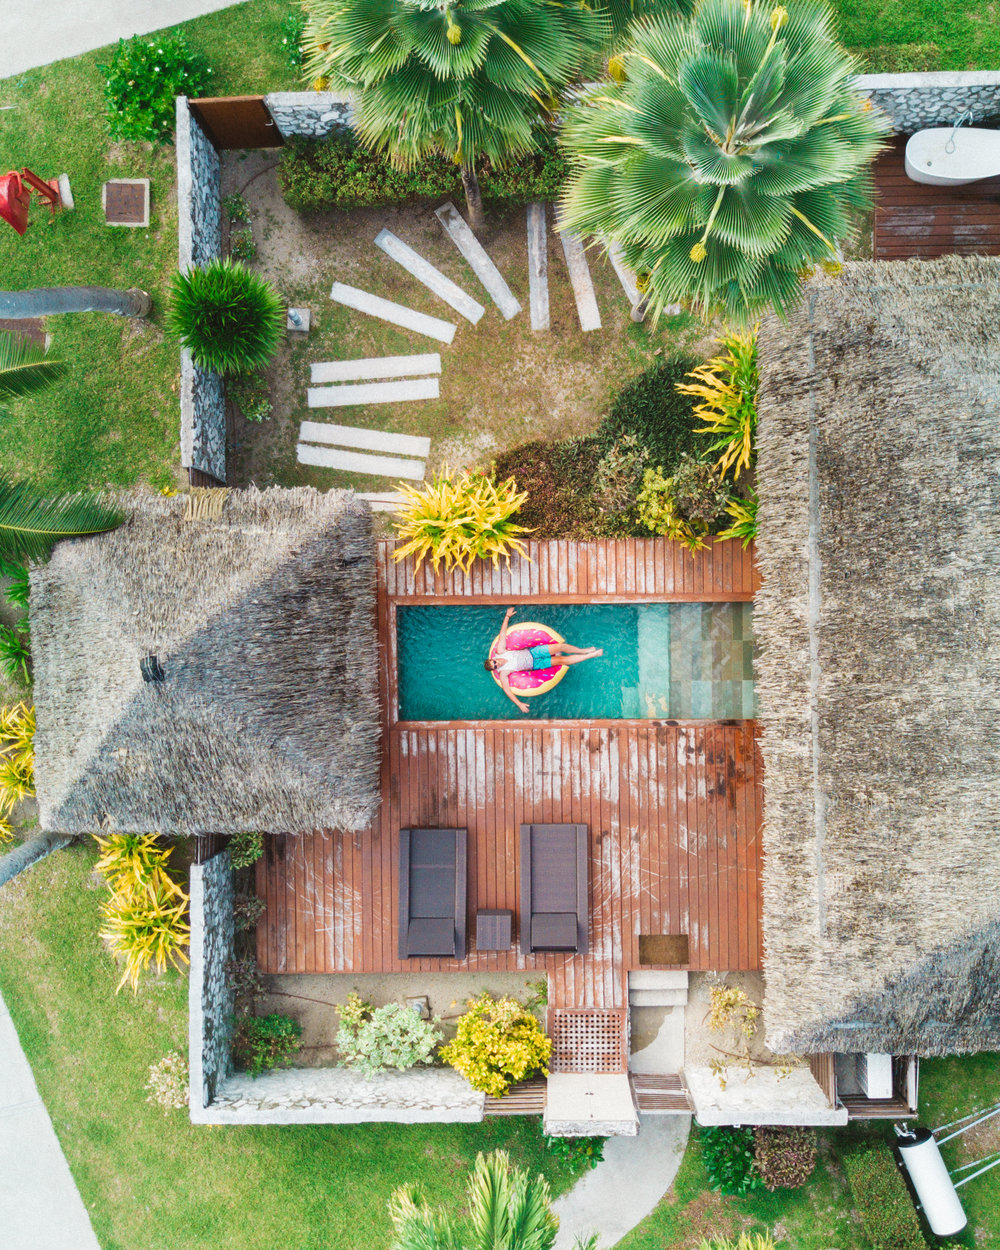 Kia Ora Resort in Rangiroa, Tahiti.